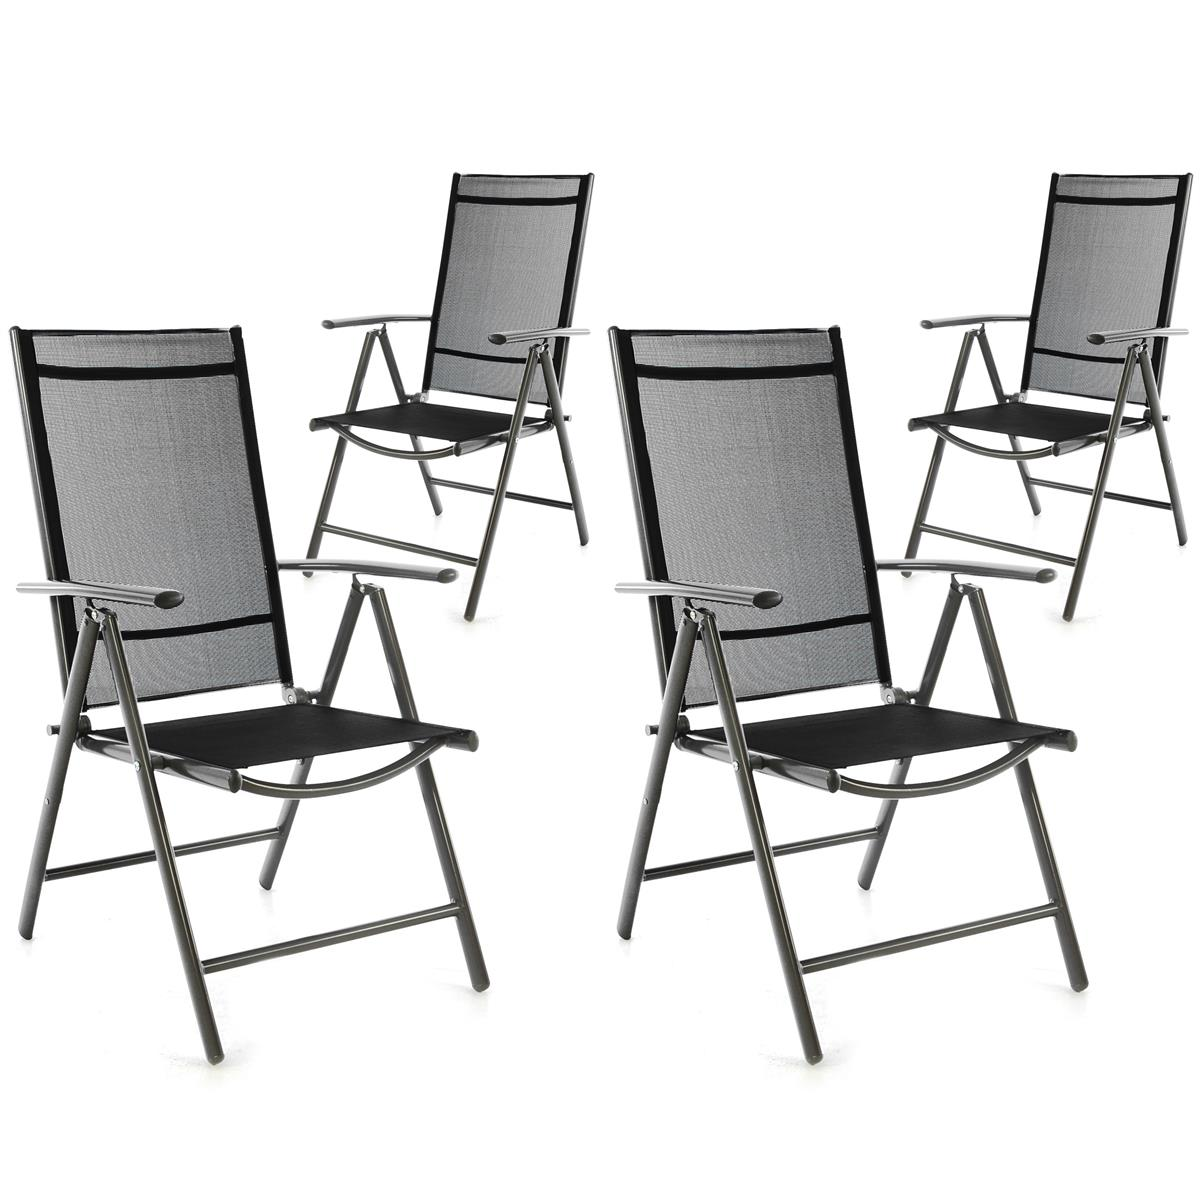 4er Set Klappstuhl Alu Rahmen dunkelgrau Textilene schwarz Hochlehner Camping